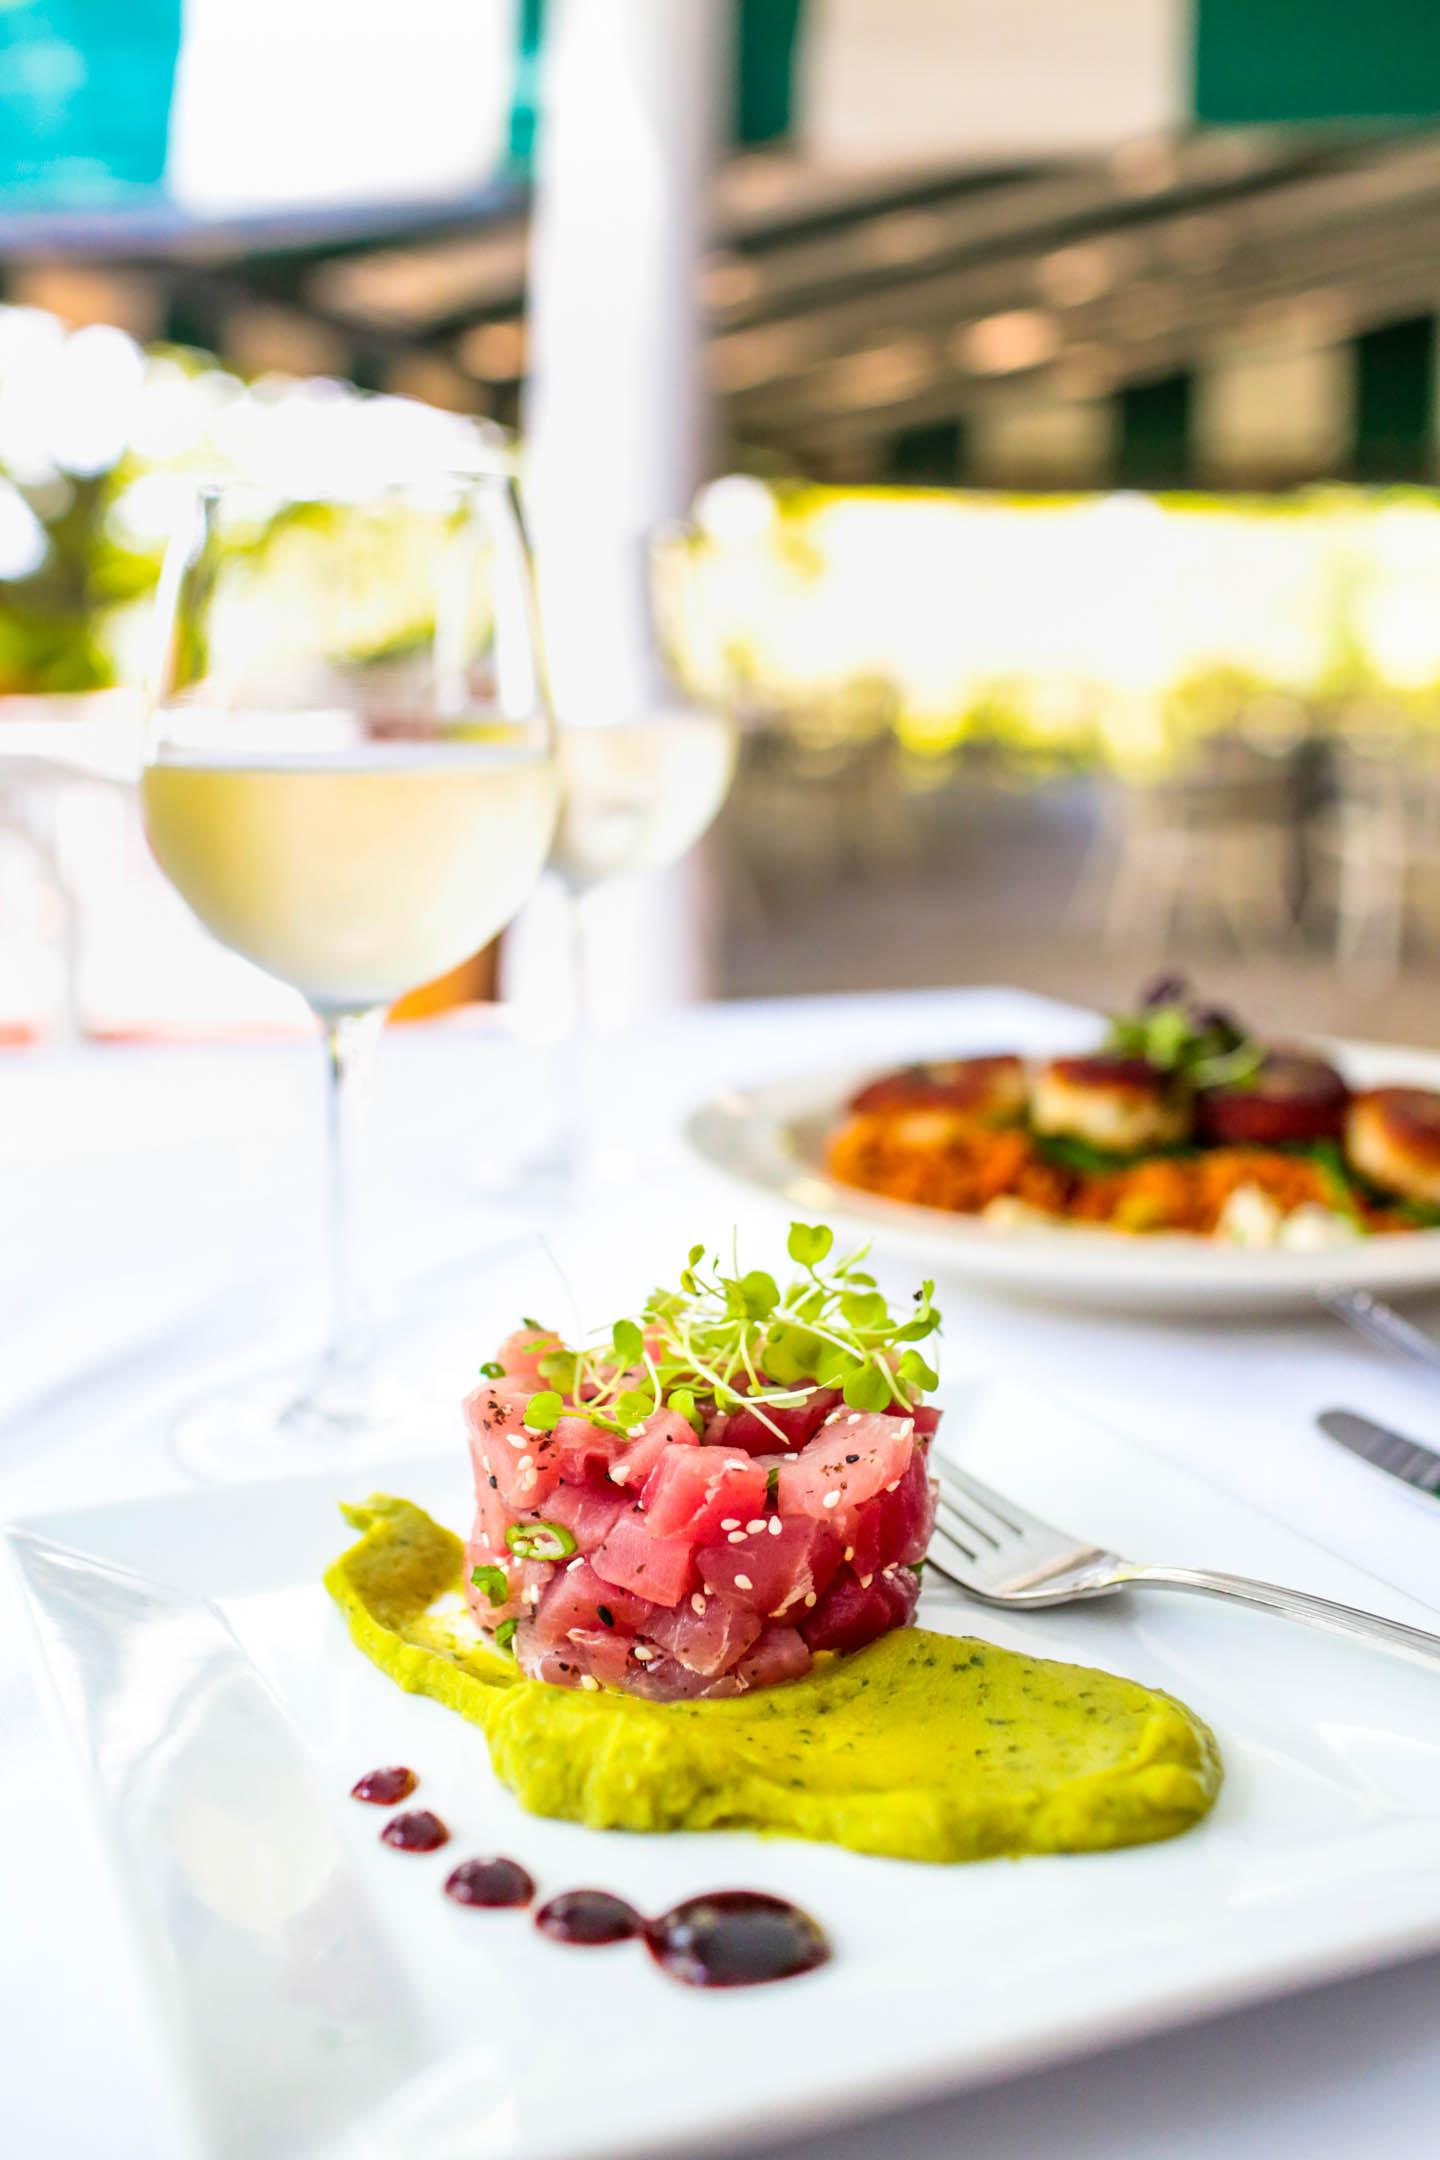 striffler-photography-lifestyle-food-Hamptons-13.jpg